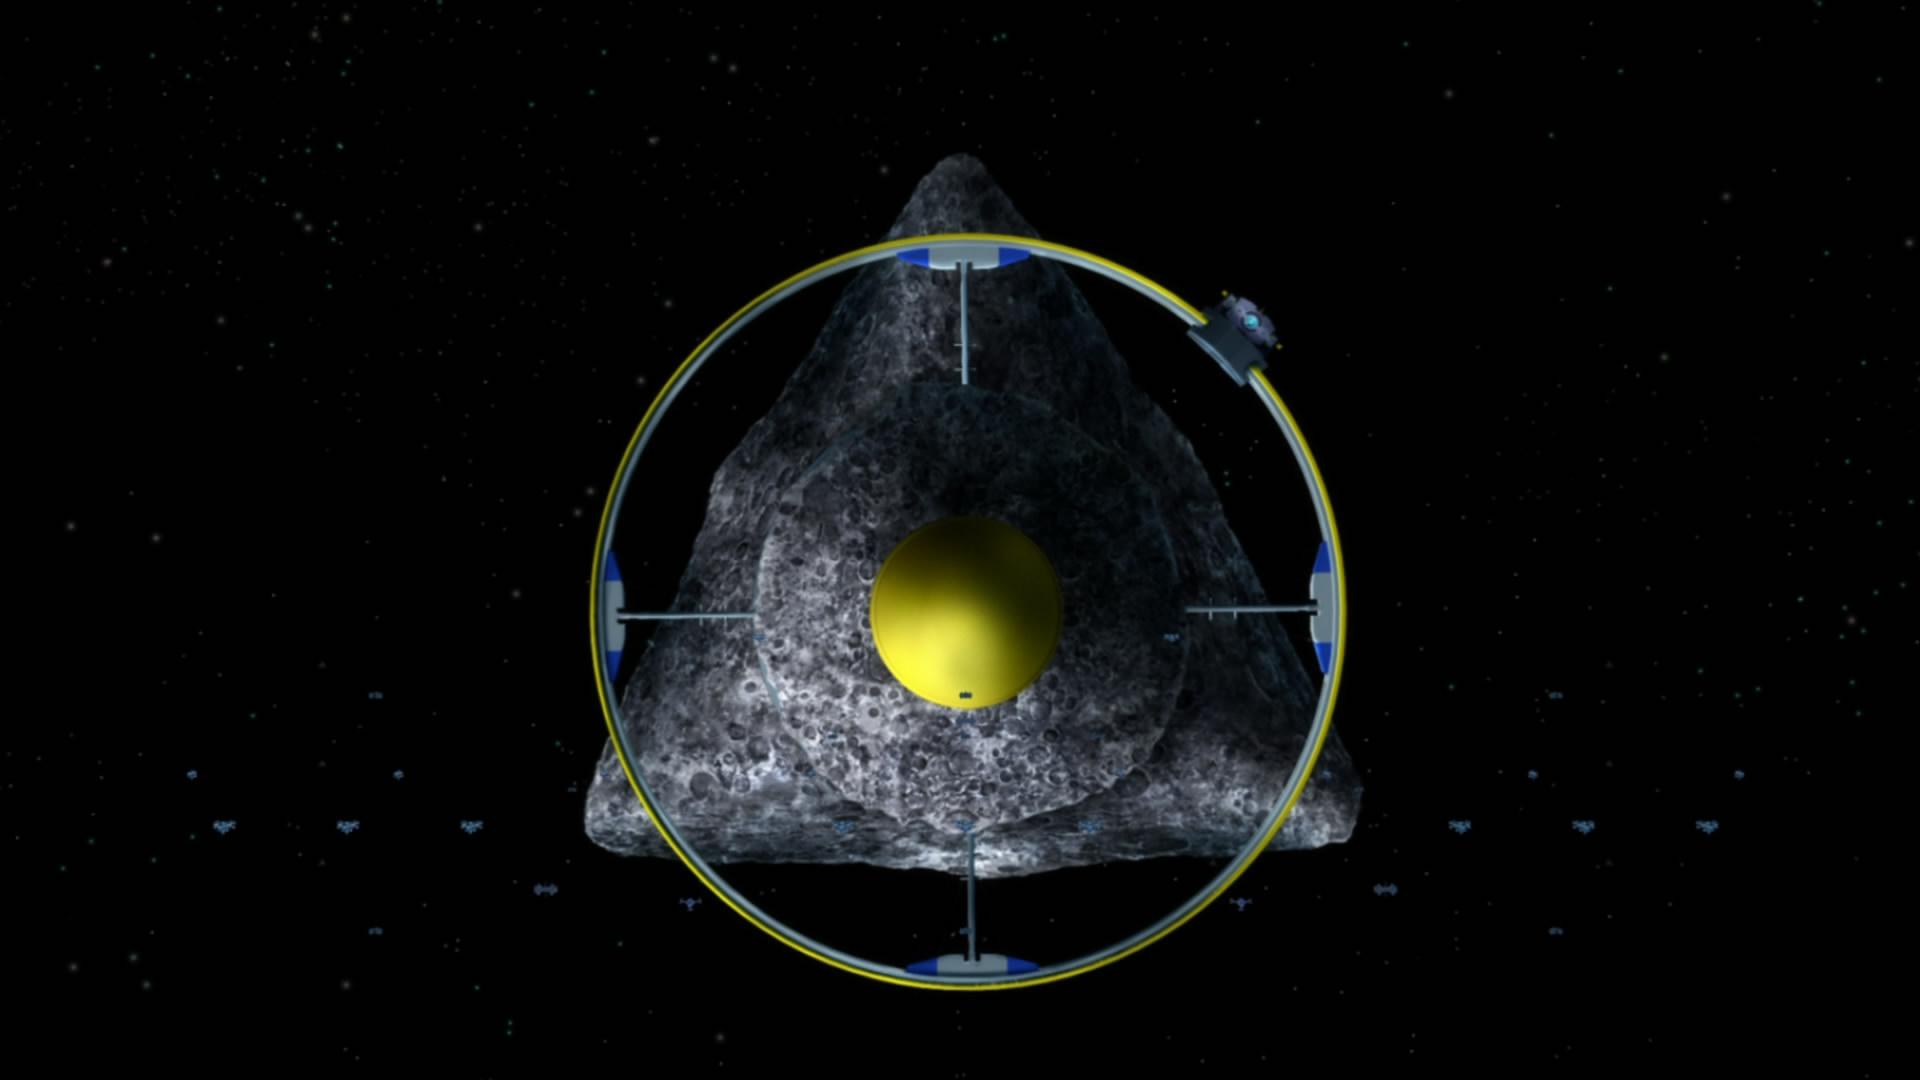 [gSS]_Mobile_Suit_Gundam_00_-_A_wakening_of_the_Trailblazer_(1080p)_[2B252856].mkv_snapshot_01.21.18_[2011.01.07_04.43.02]